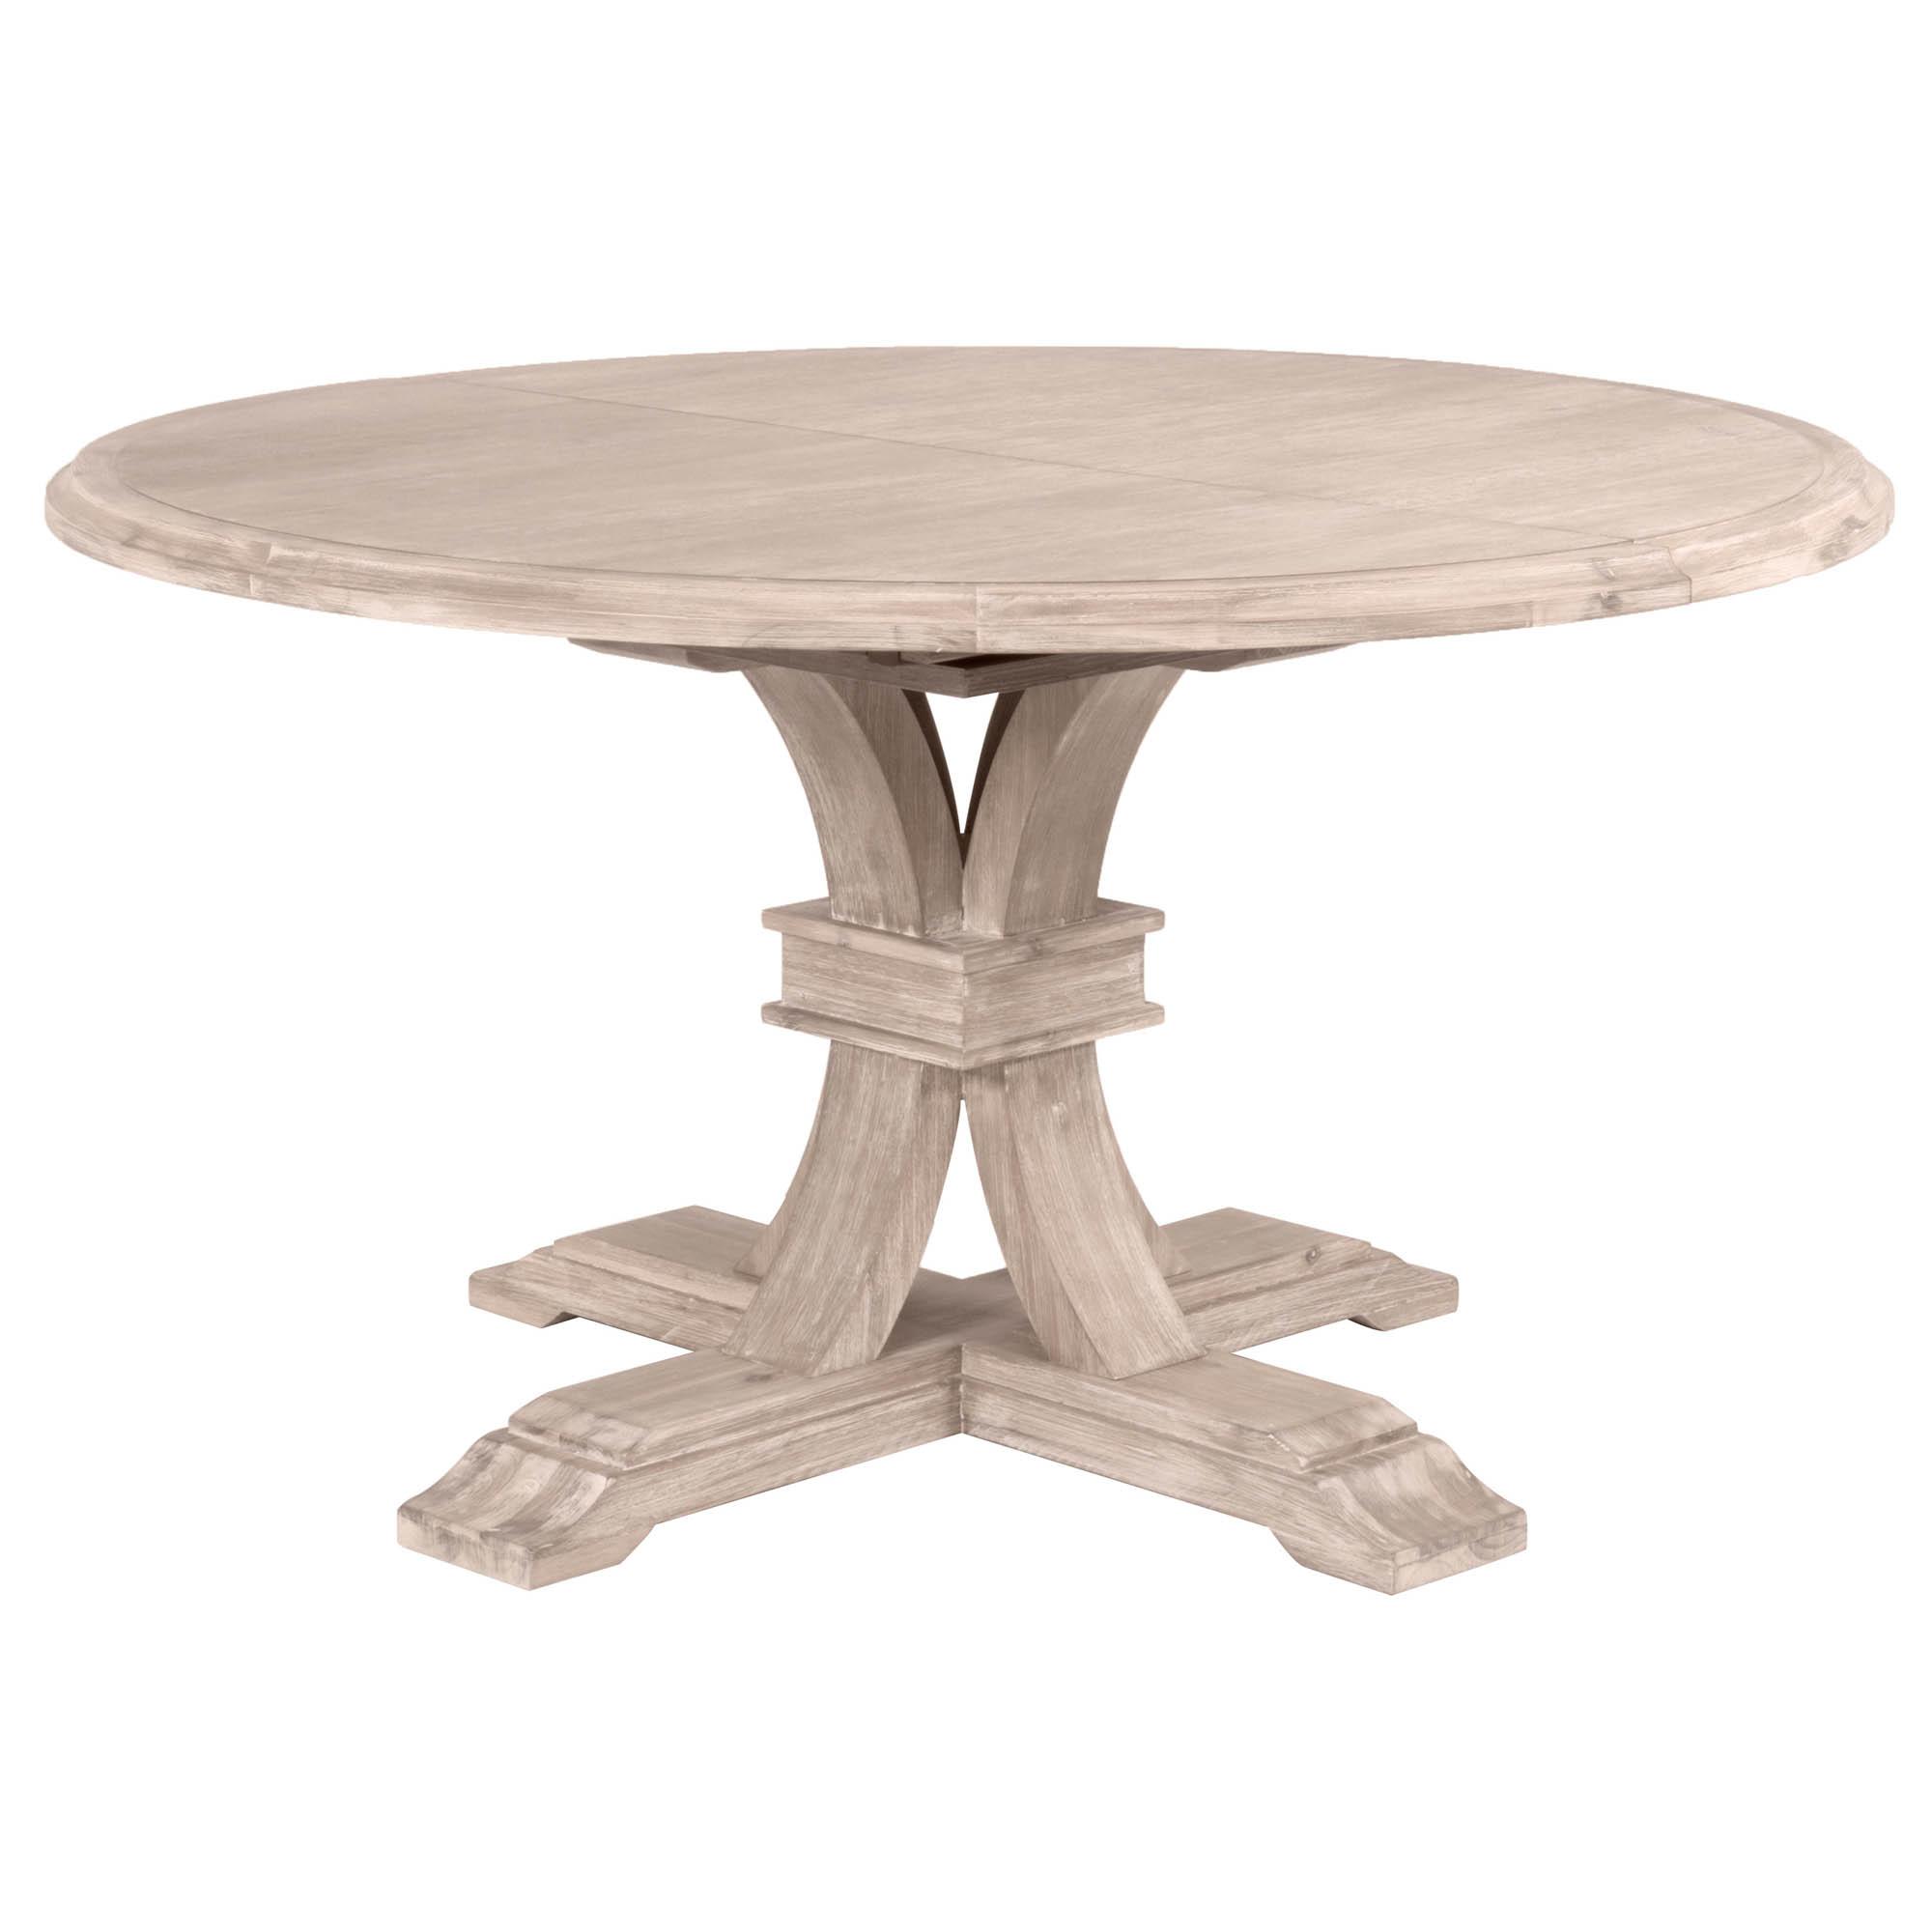 Devon Round Extension Dining Table - Natural Gray_1-02.jpg